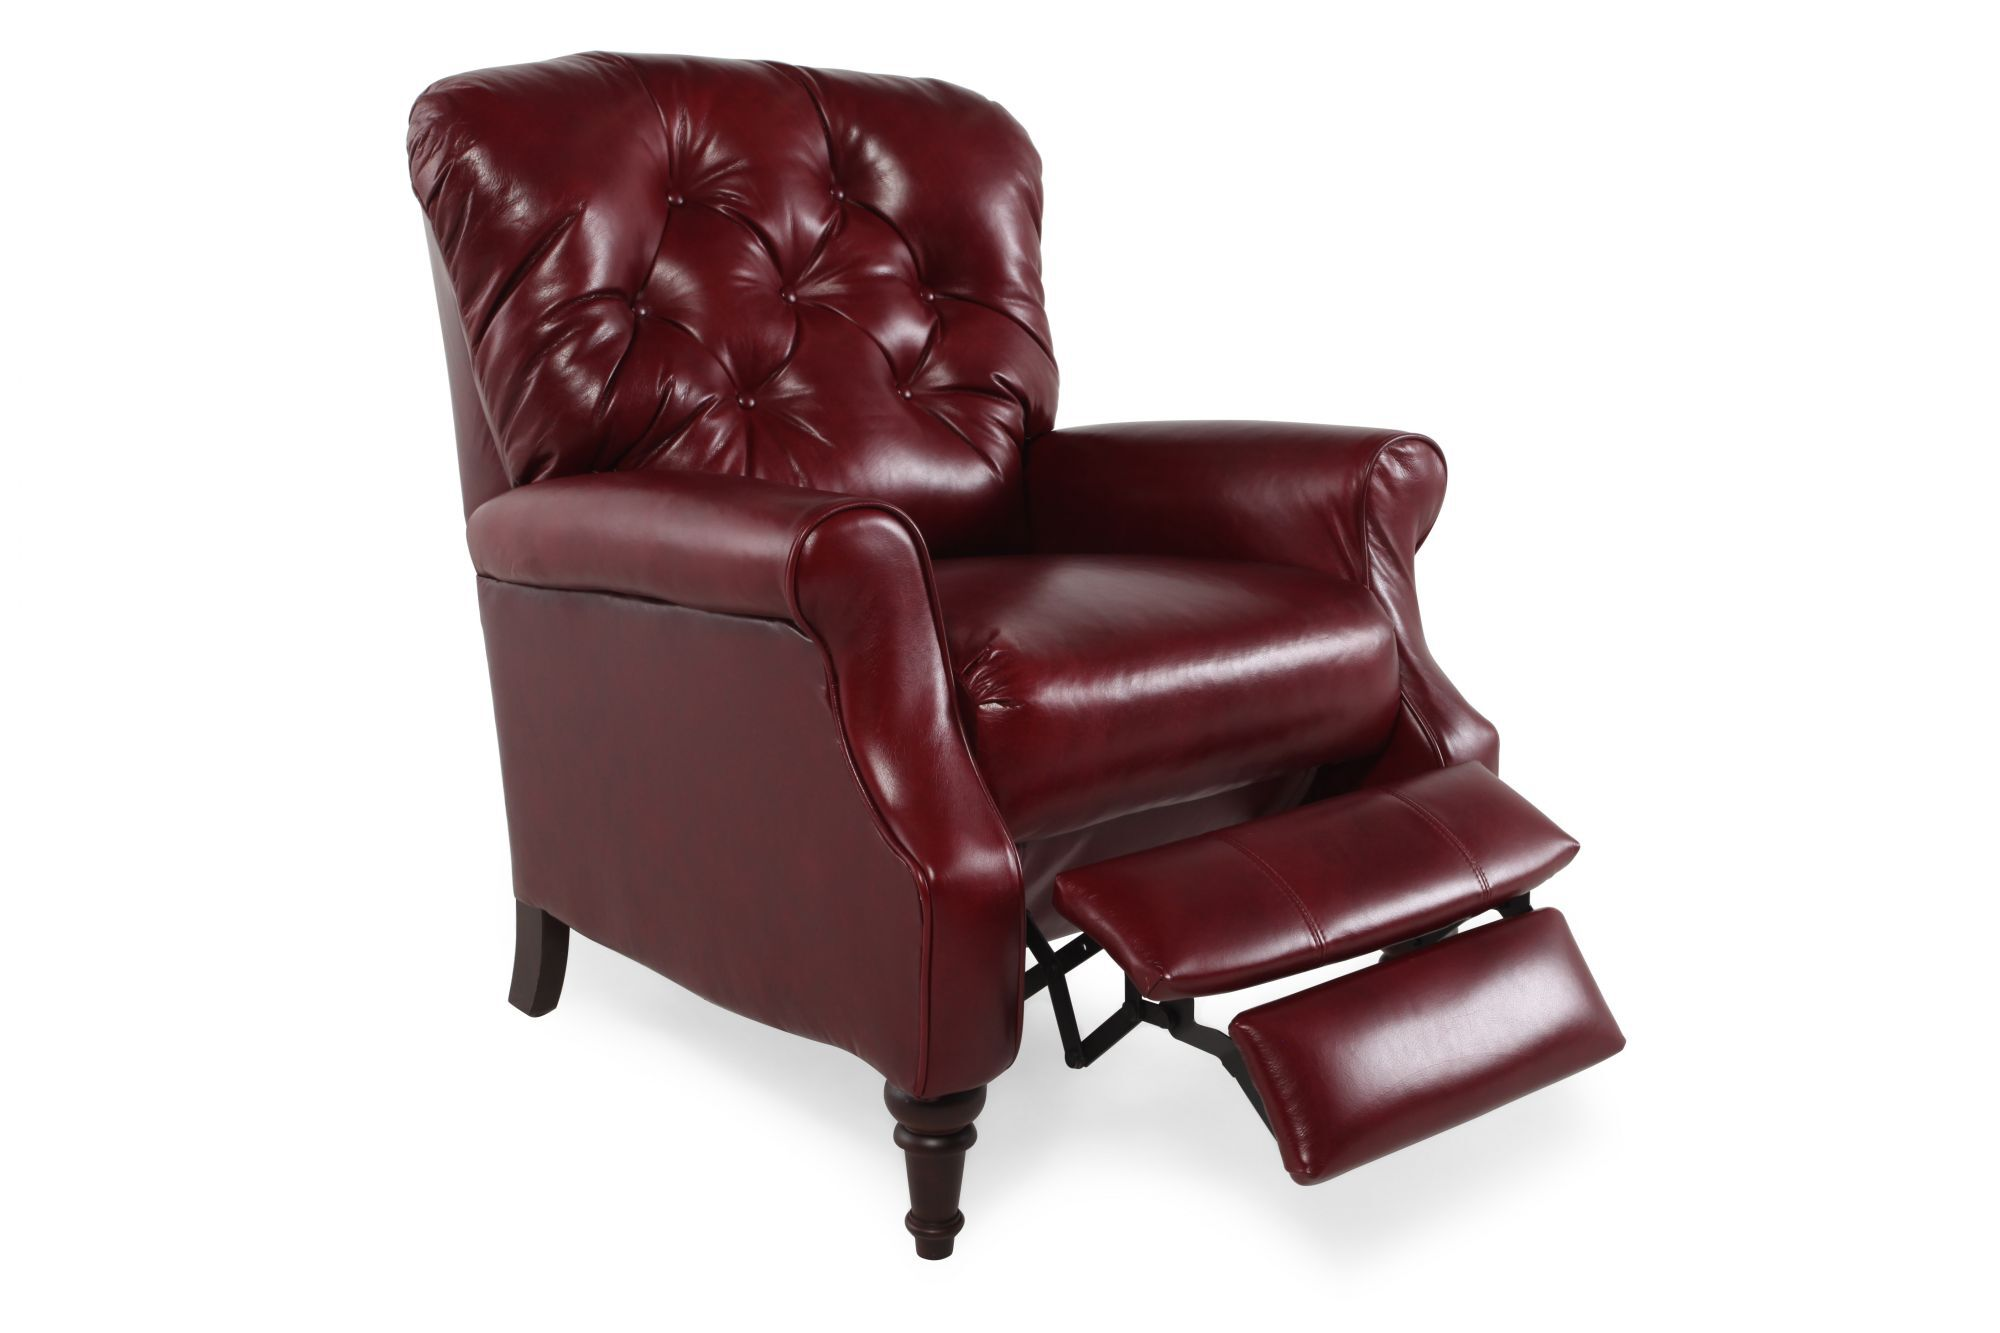 Lane Belle Furia Recliner  sc 1 st  Mathis Brothers & Lane Belle Furia Recliner | Mathis Brothers Furniture islam-shia.org